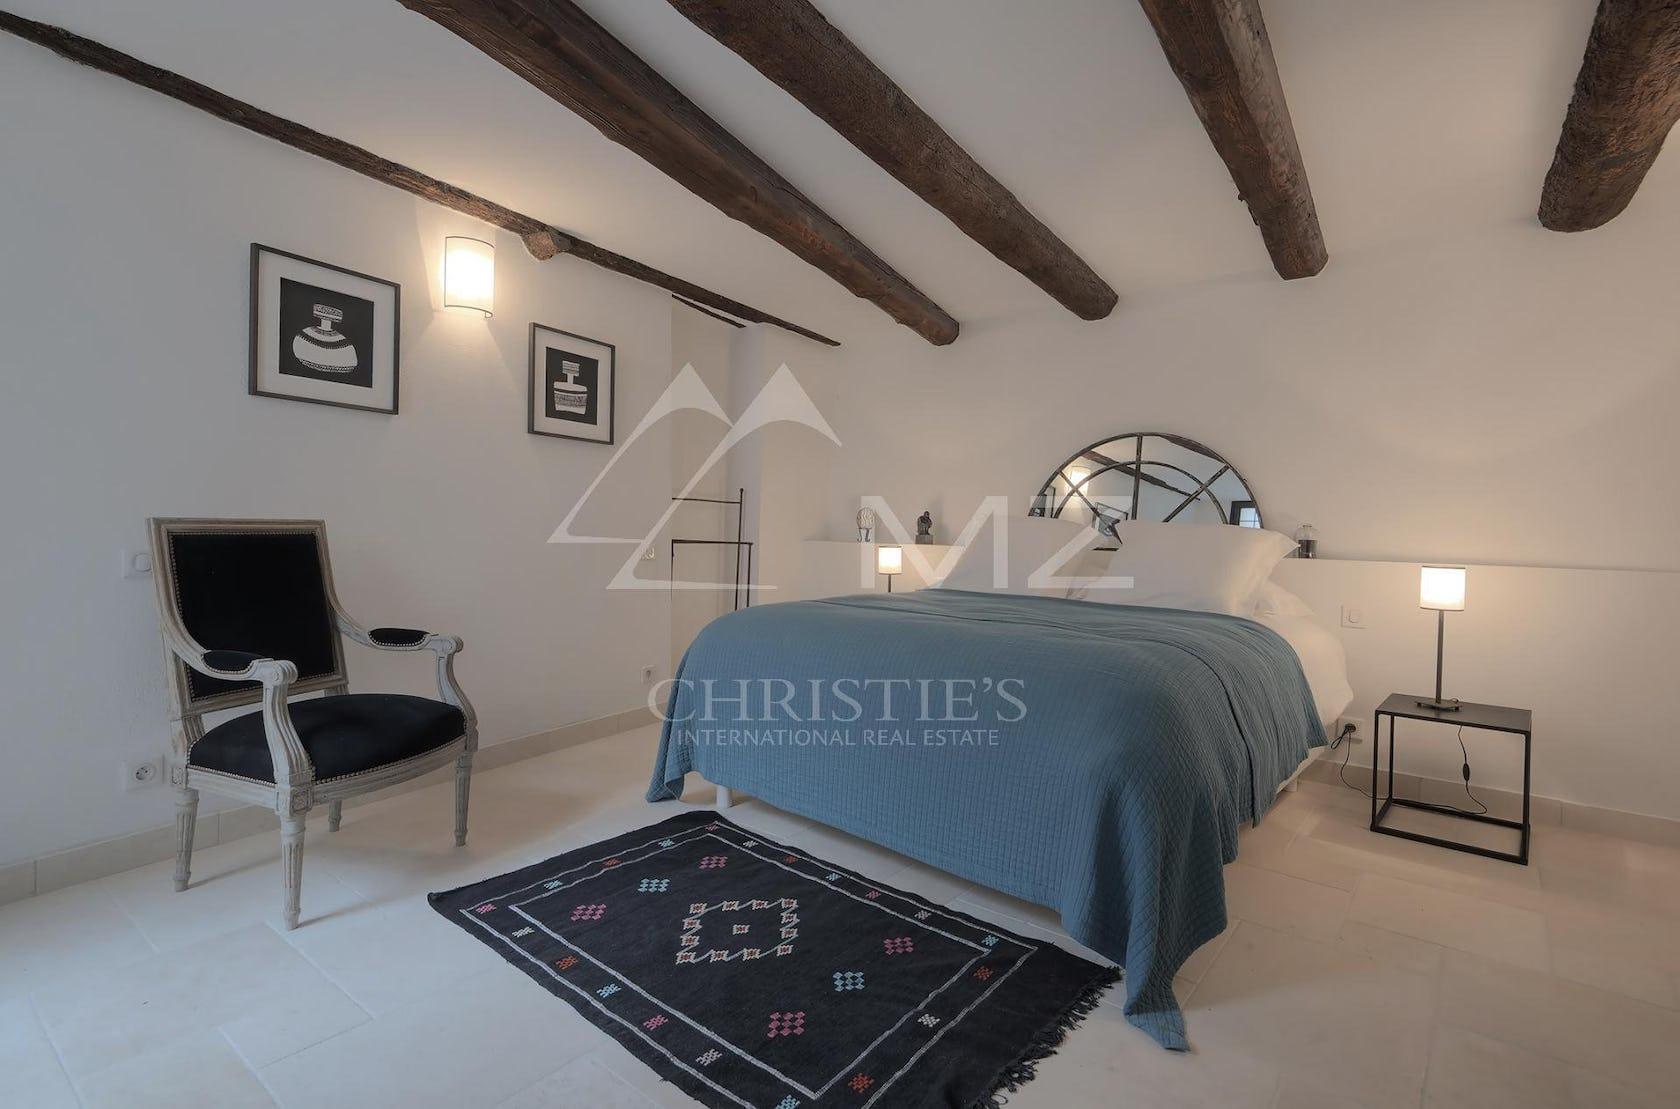 loft housing building indoors attic chair furniture rug bed bedroom